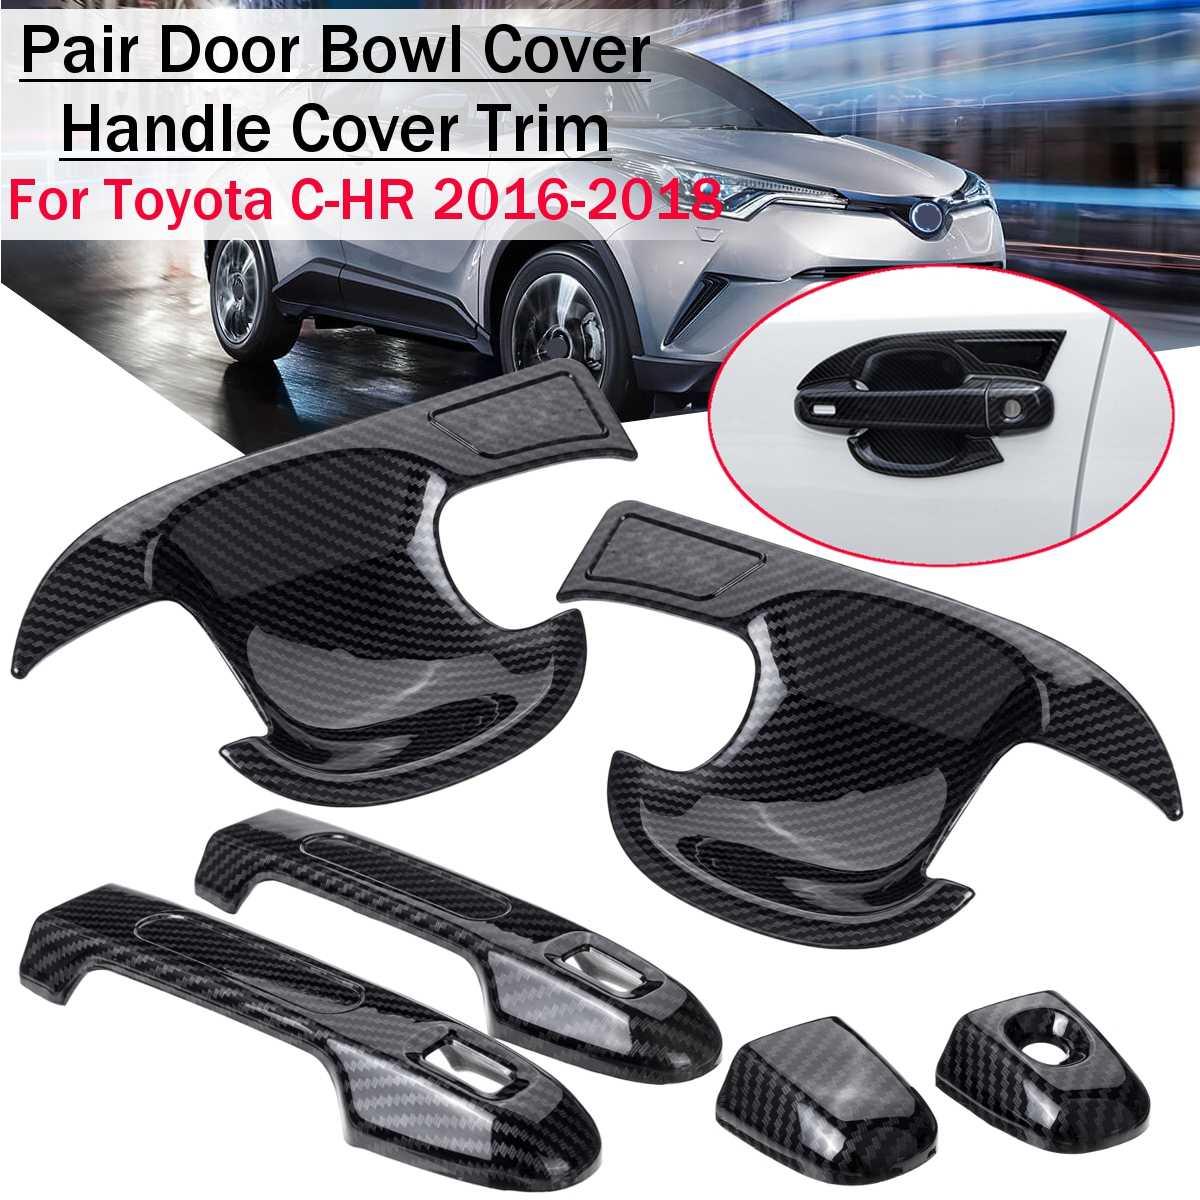 ABS Carbon fiber Front Side Door Handle Cover Trim For Toyota C-HR CHR 2016 2017